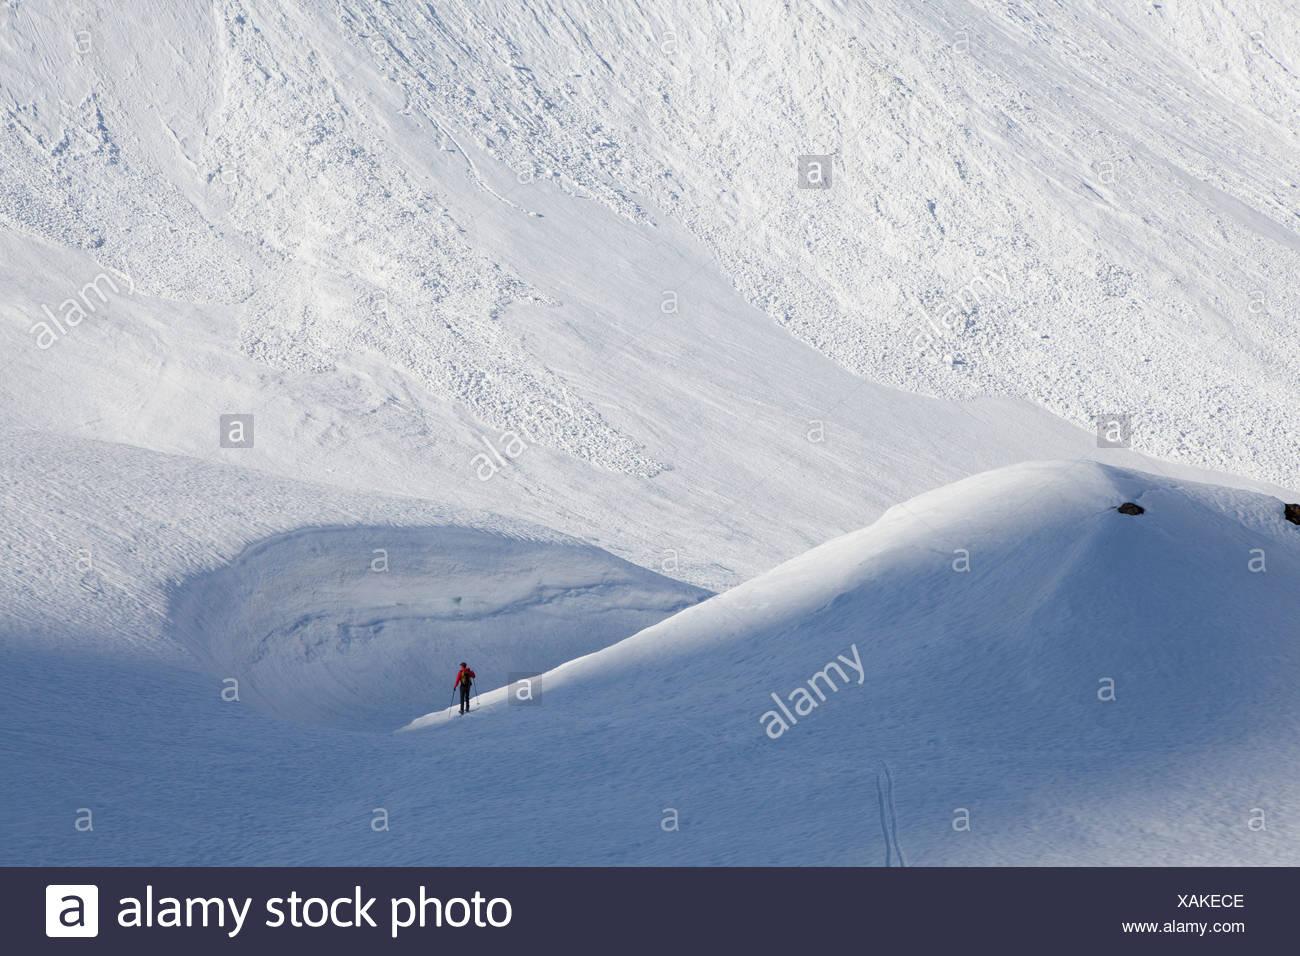 Back-country skier near snowdrift, Canton of Ticino, Switzerland - Stock Image